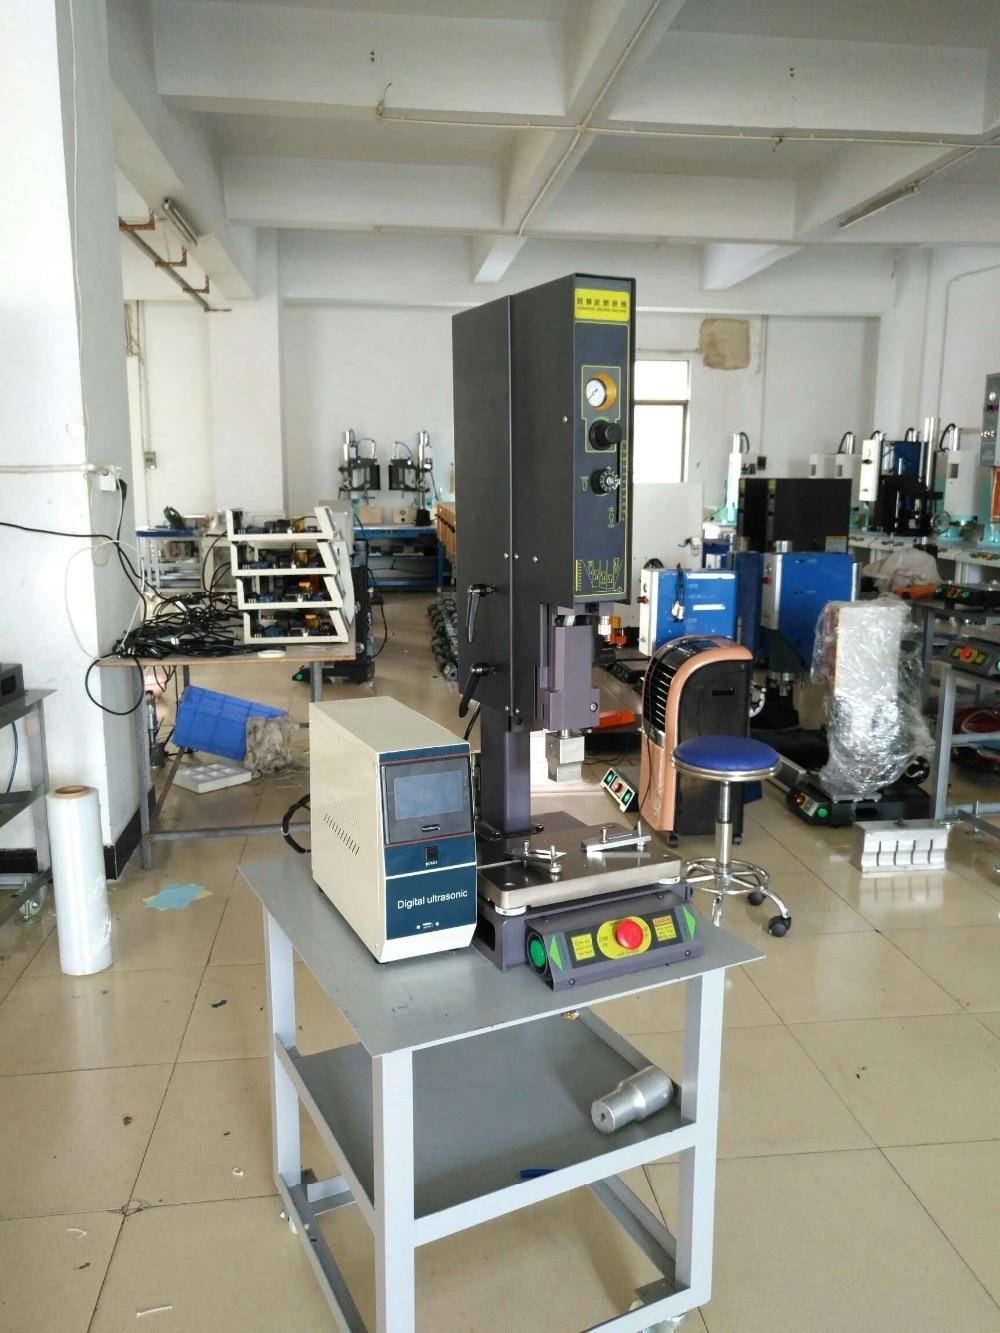 35Khz1000W ultrasonic Plastic welding machine,Digital ultrasonic welding machine 35khz